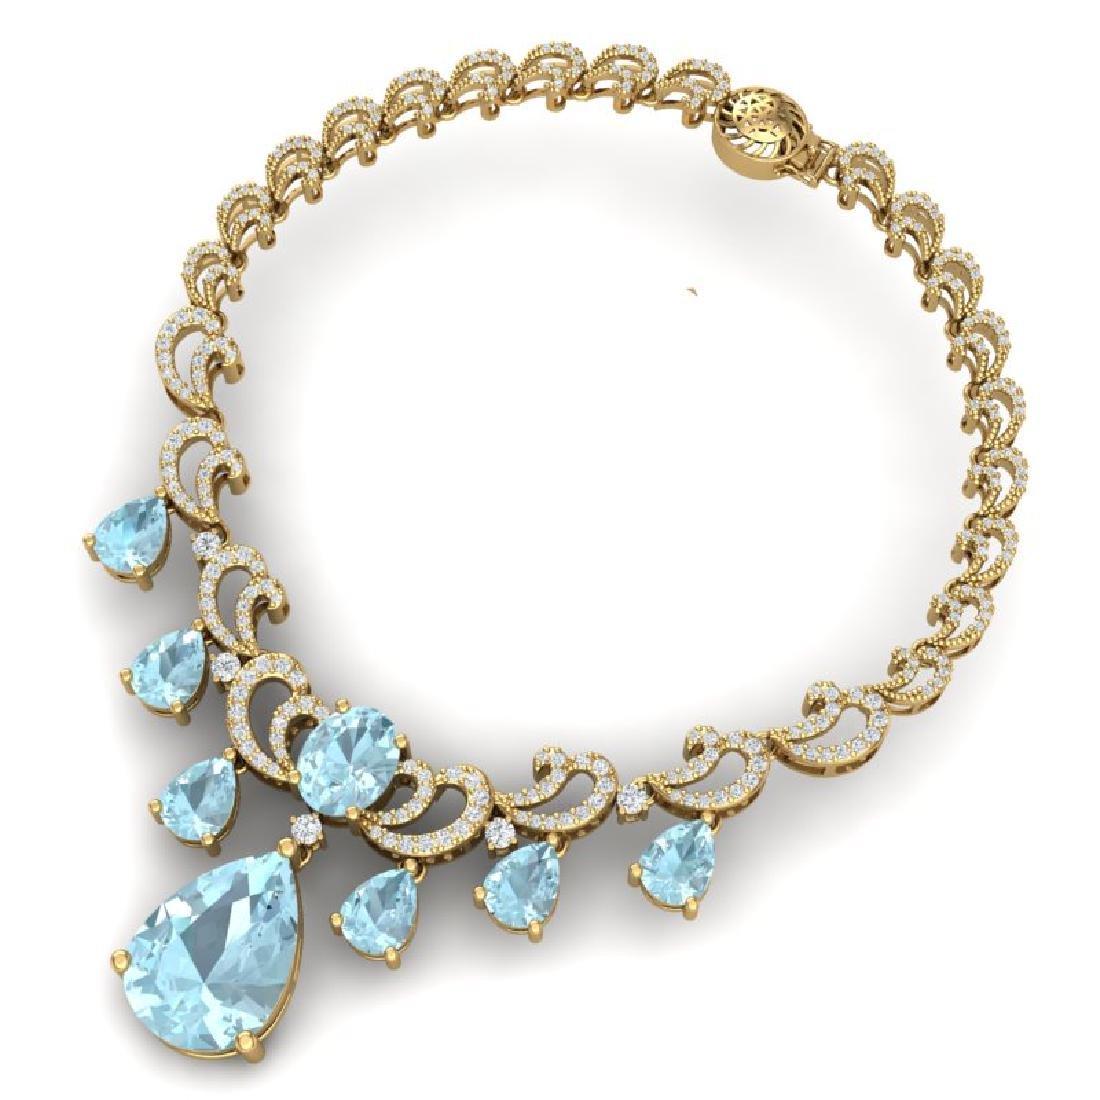 34.69 CTW Royalty Sky Topaz & VS Diamond Necklace 18K - 3